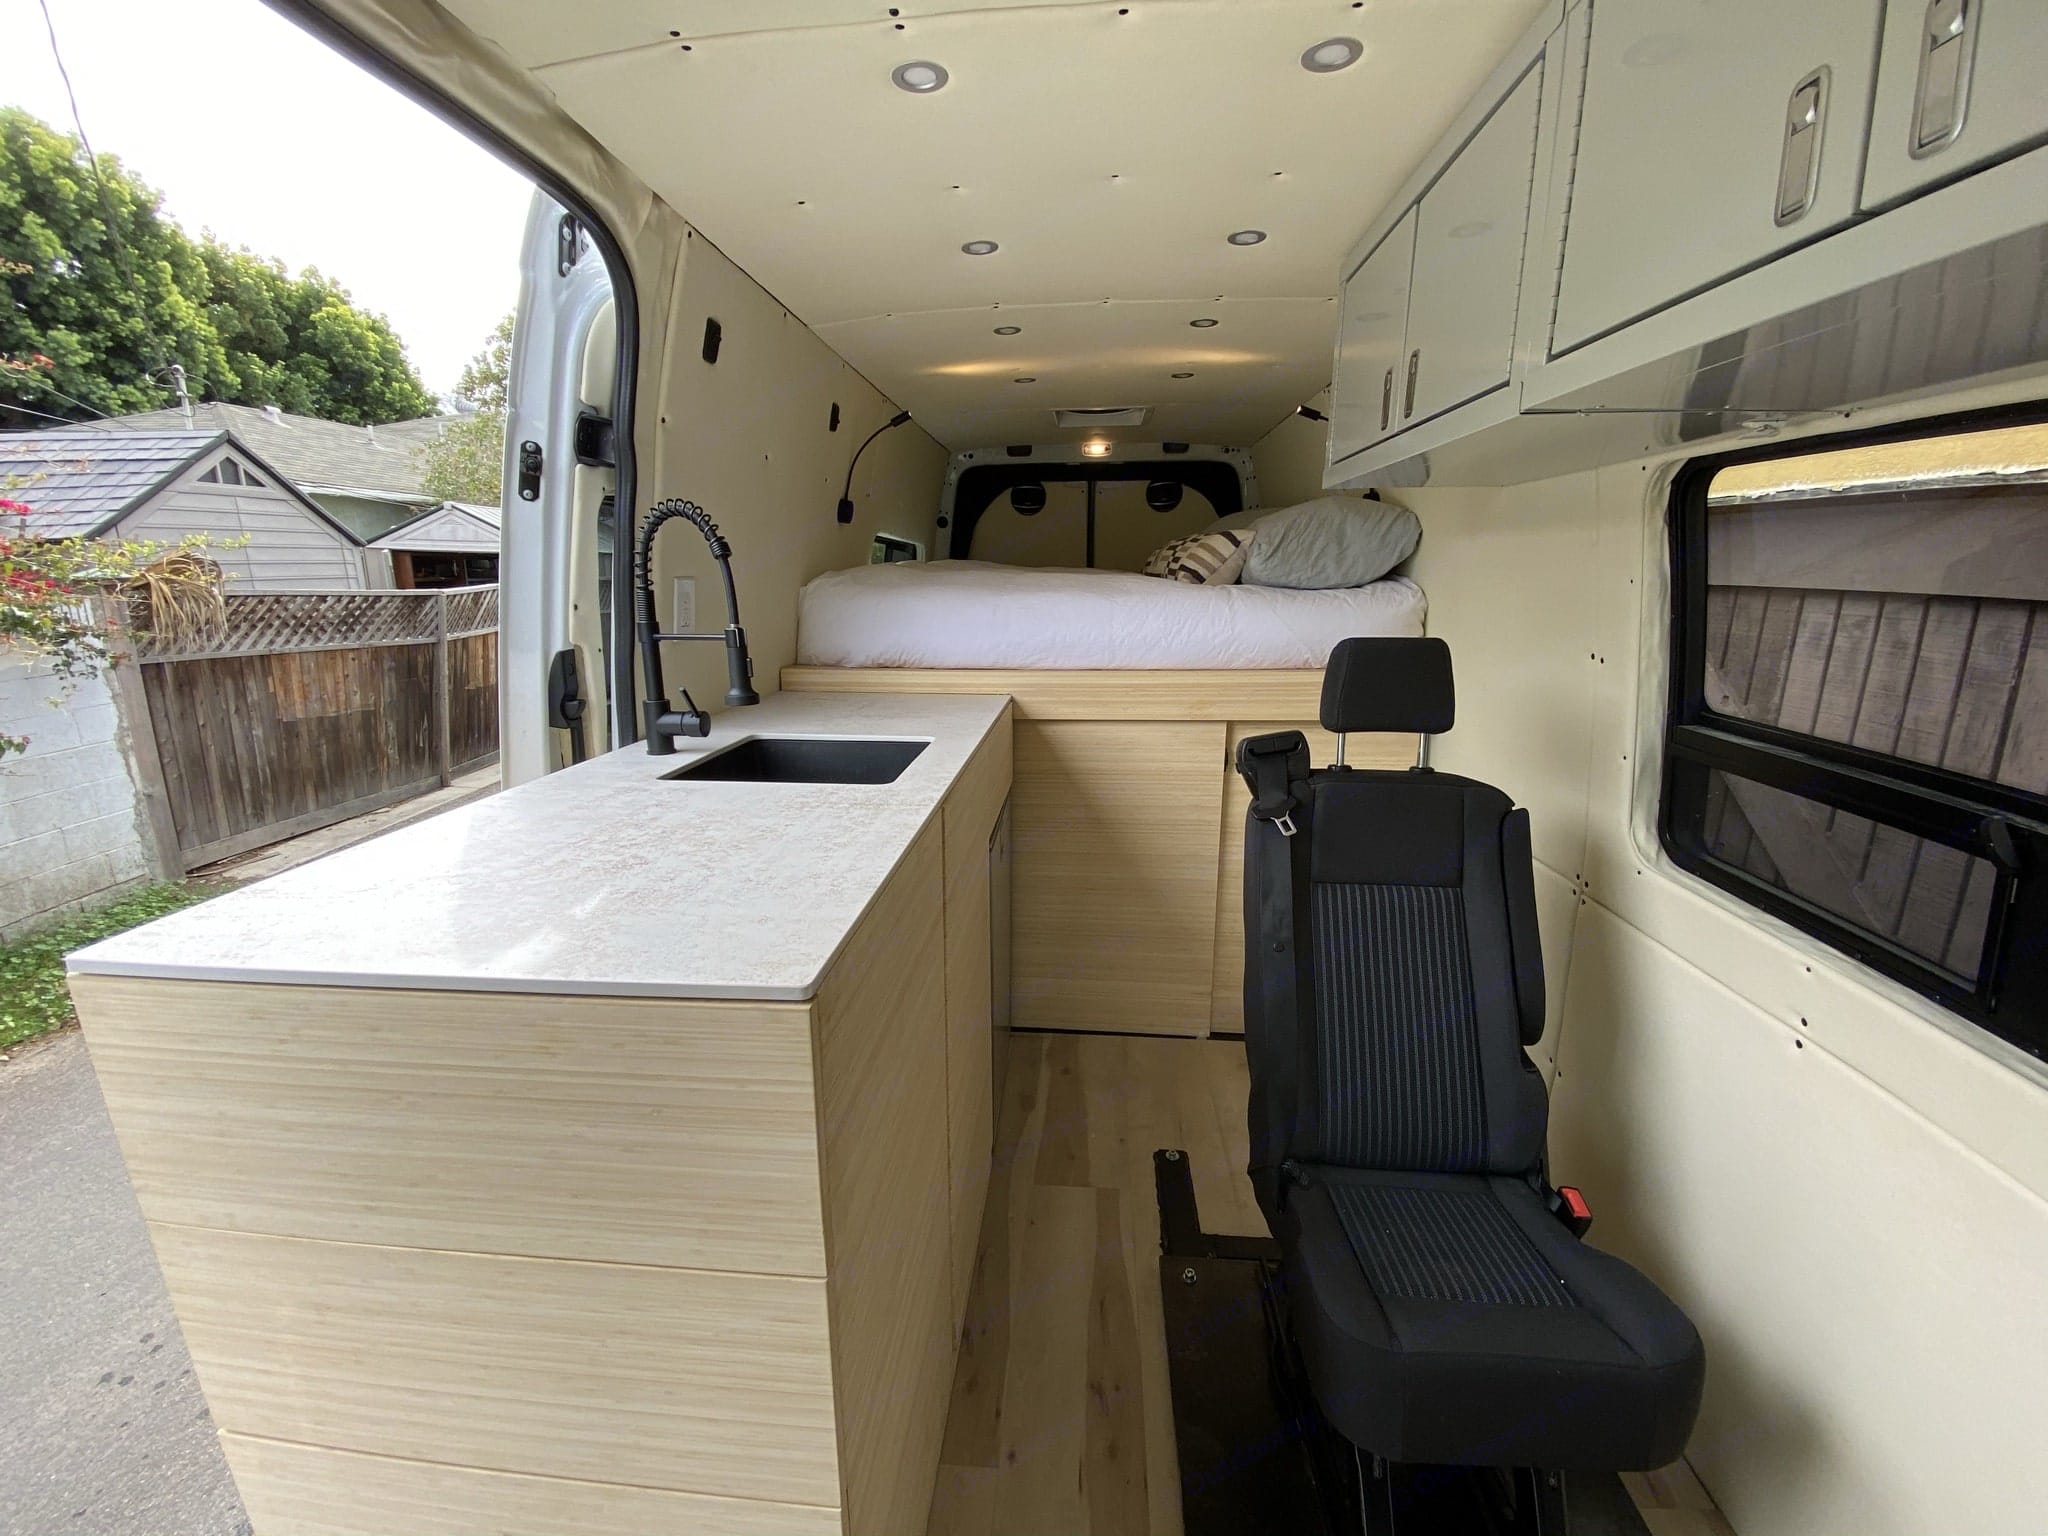 Gorgeous hardwood quiet closing cabinets, hardwood floors, 2 burner induction stove & farm sink. Mercedes-Benz 4x4 Sprinter mwb 2019